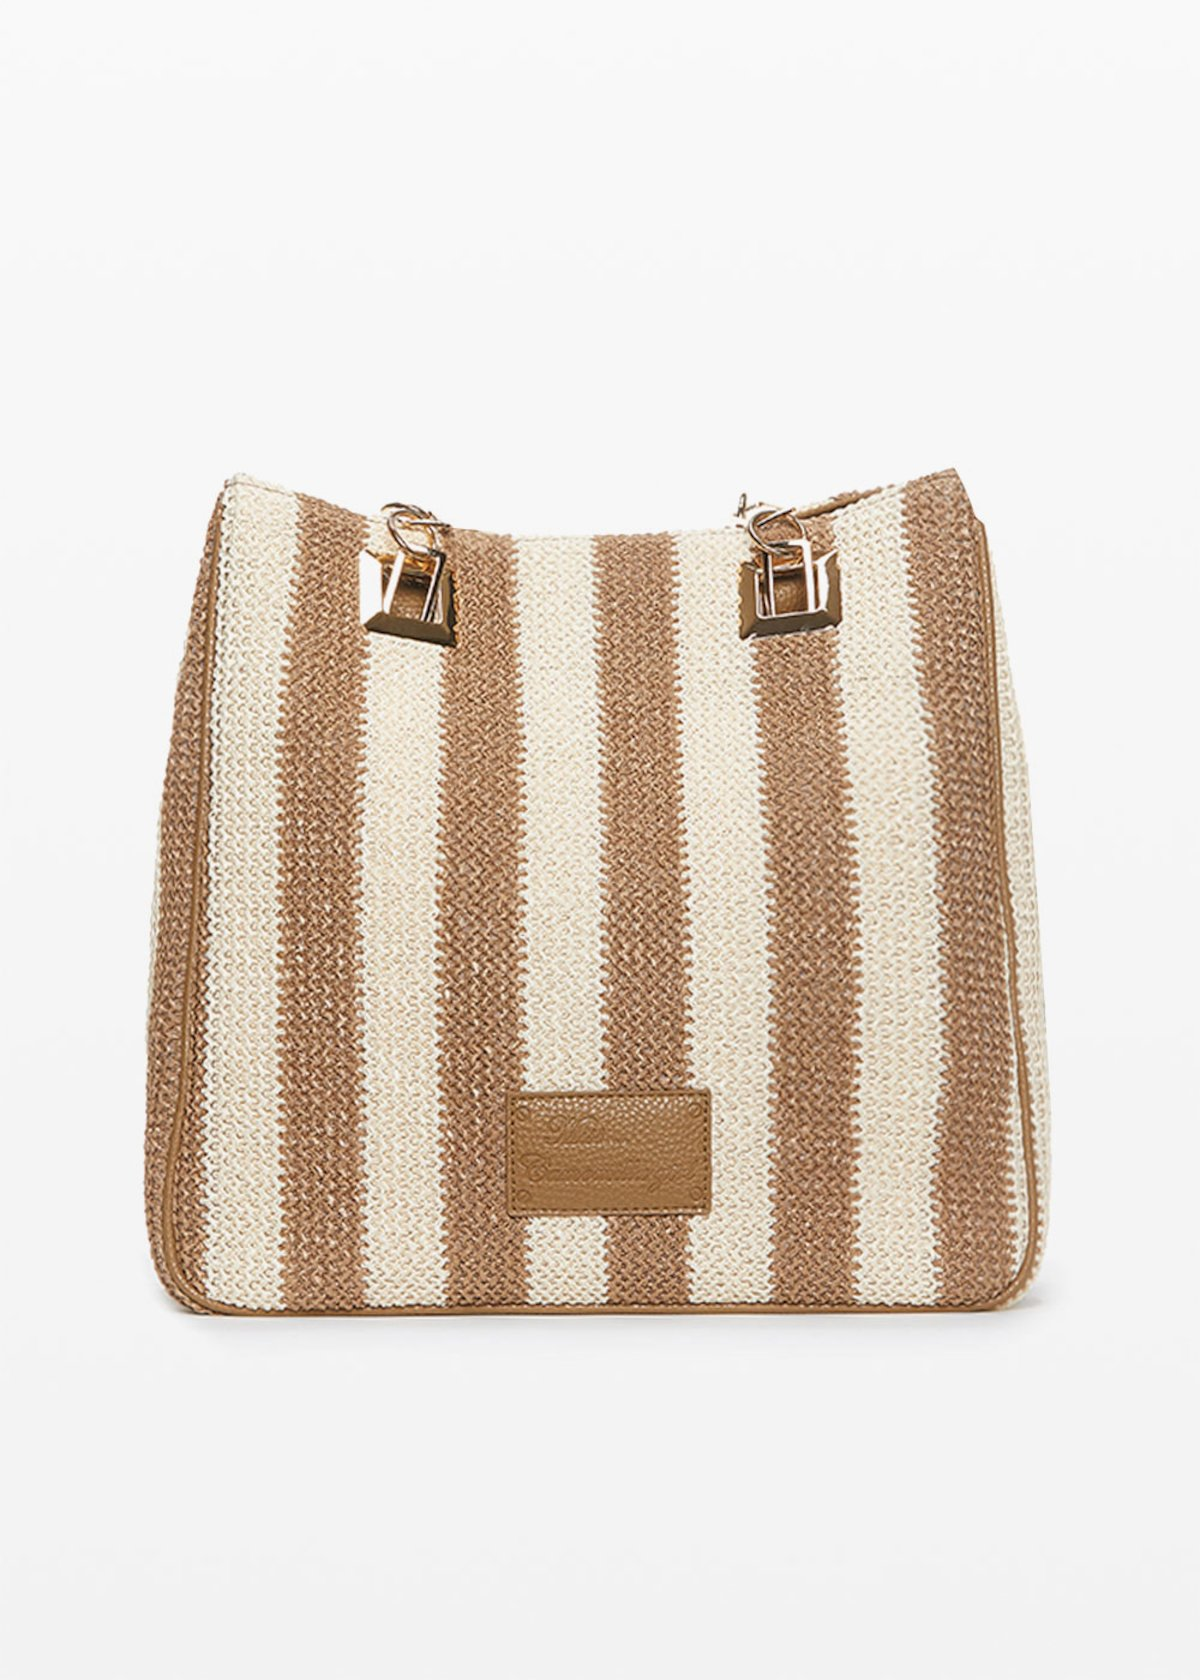 Mmissstri bag with stripes pattern - Desert / White Stripes - Woman - Category image